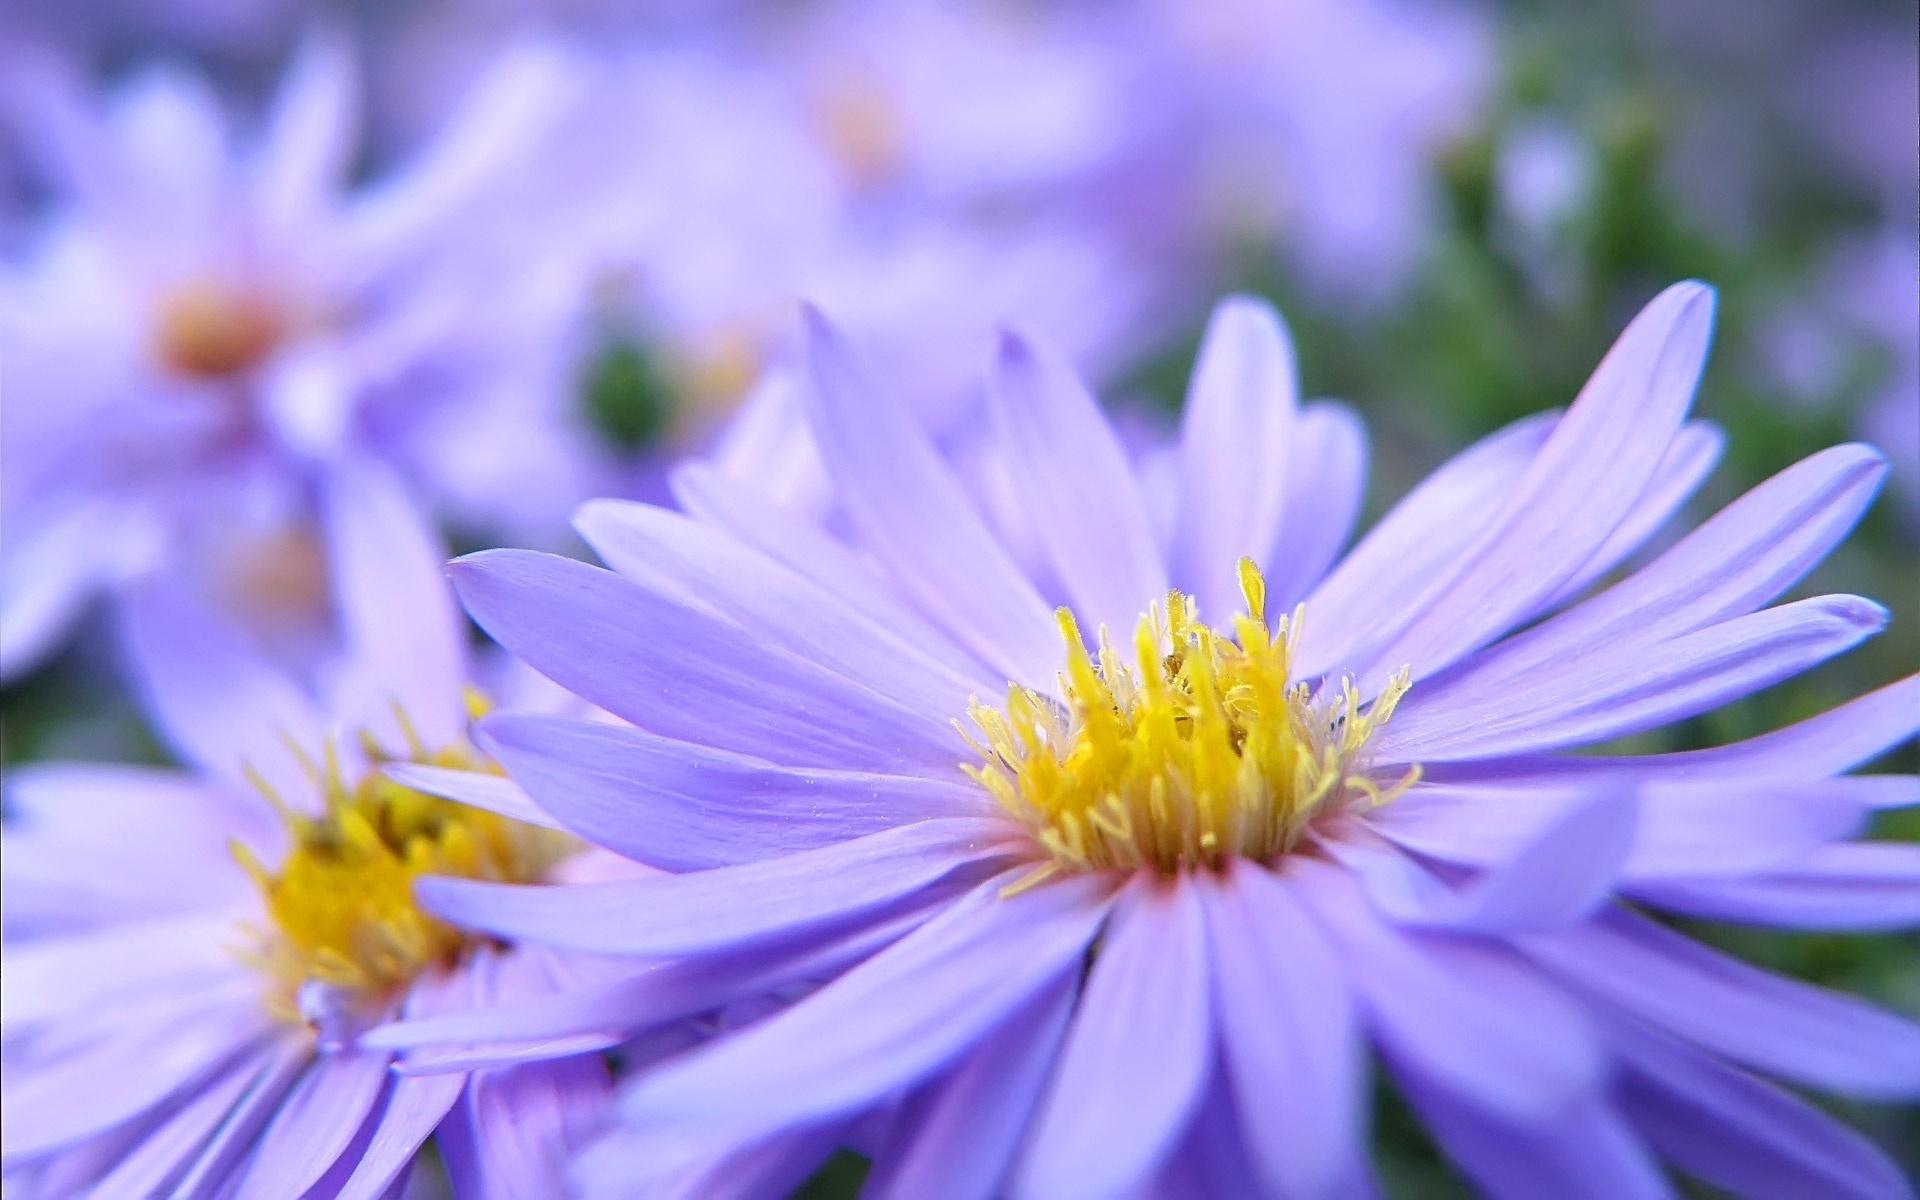 Download Wallpaper 1920x1200 Purple Flower Petals Macro Hd Background